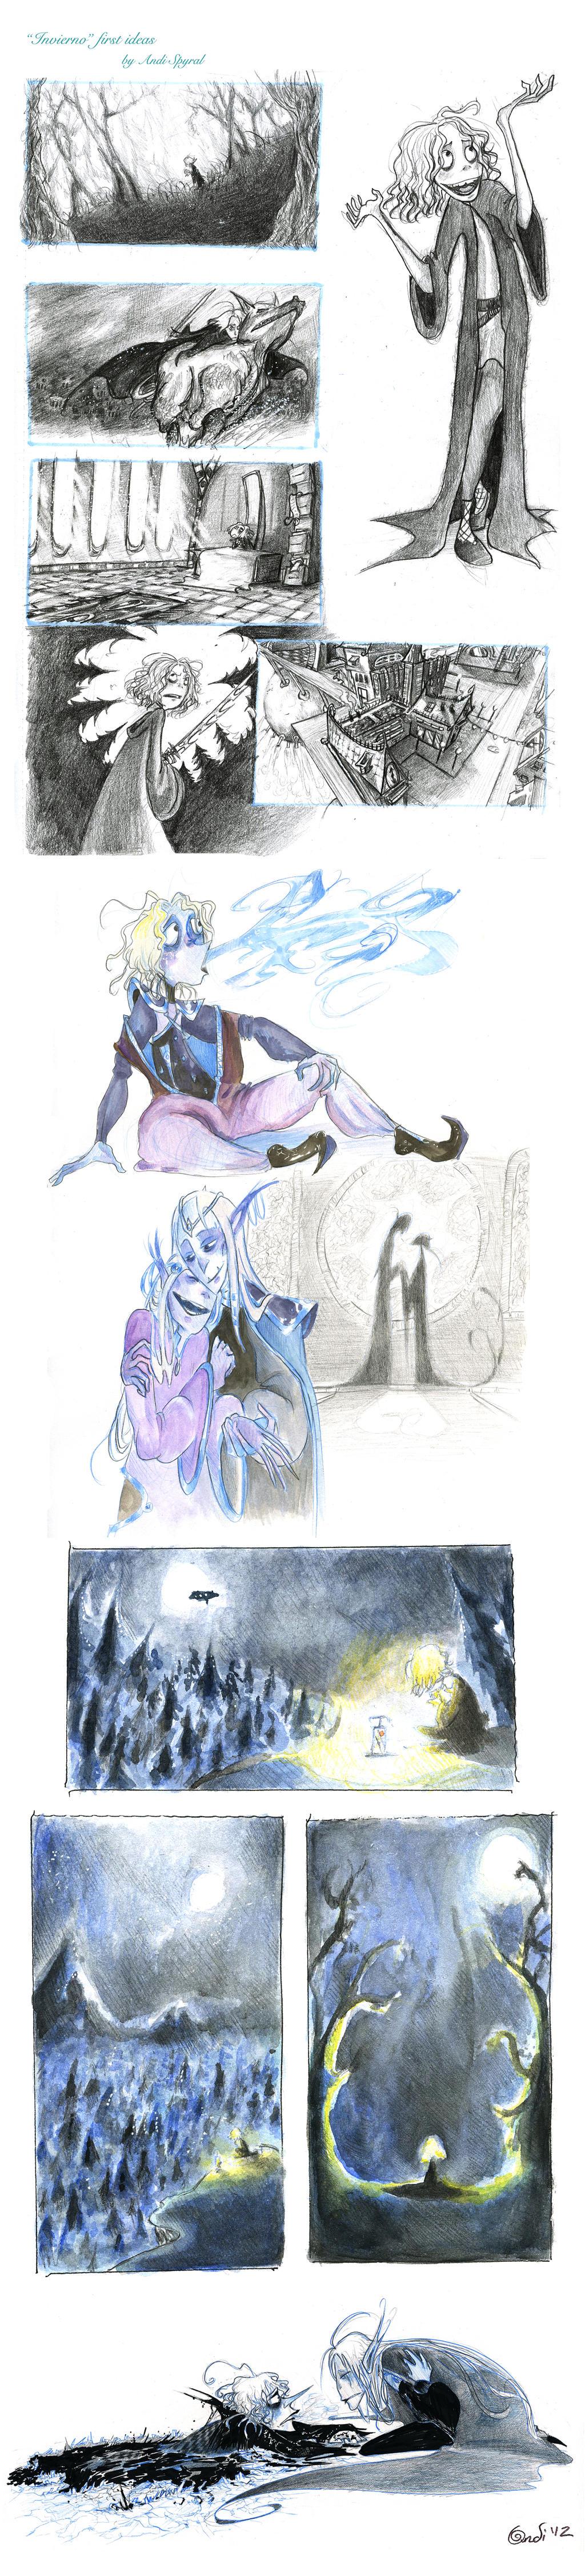 Invierno sketch dump by CountANDRA